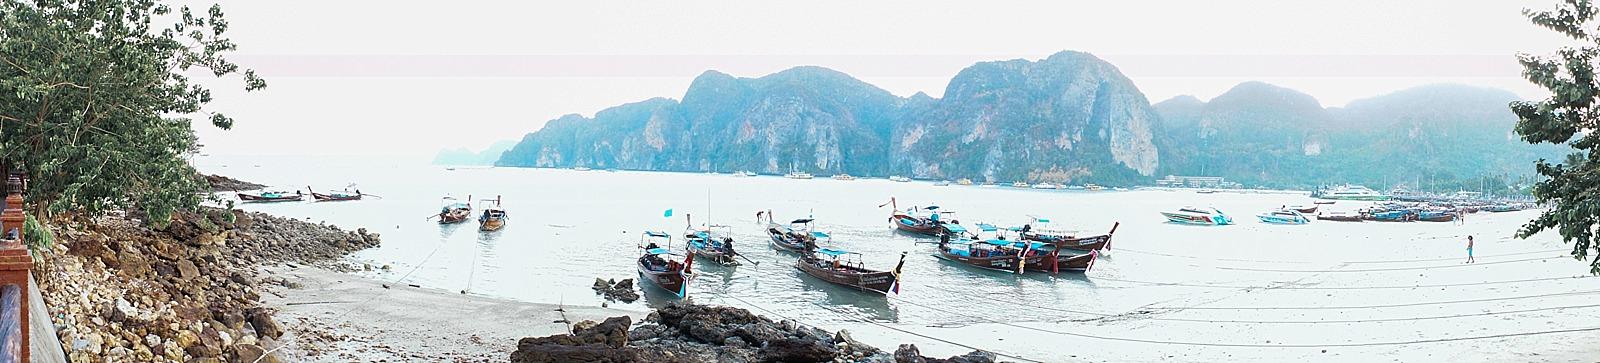 Thailand-diana-elizabeth-travel-blogger-phoenix-koh-ko-phi-phi-island-375